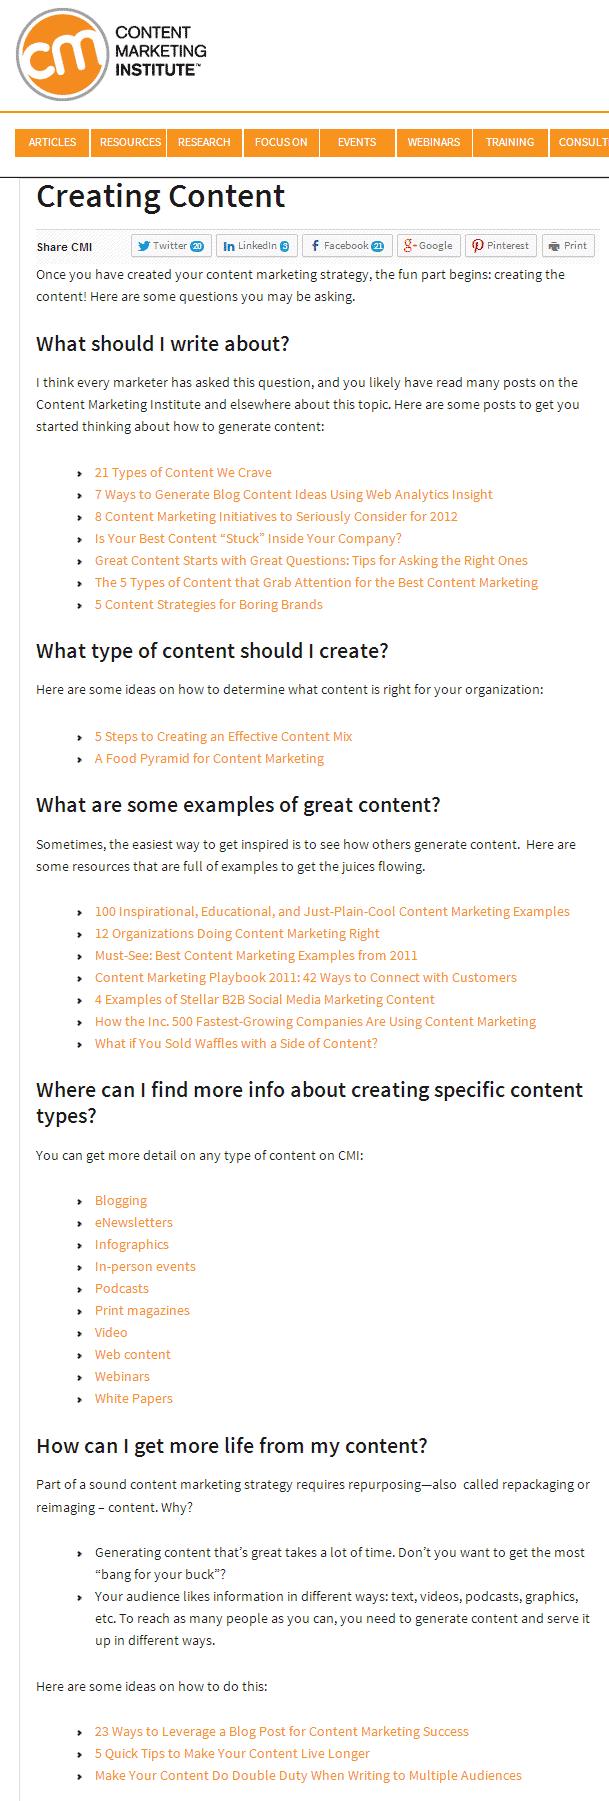 Content Marketing Institute screenshot